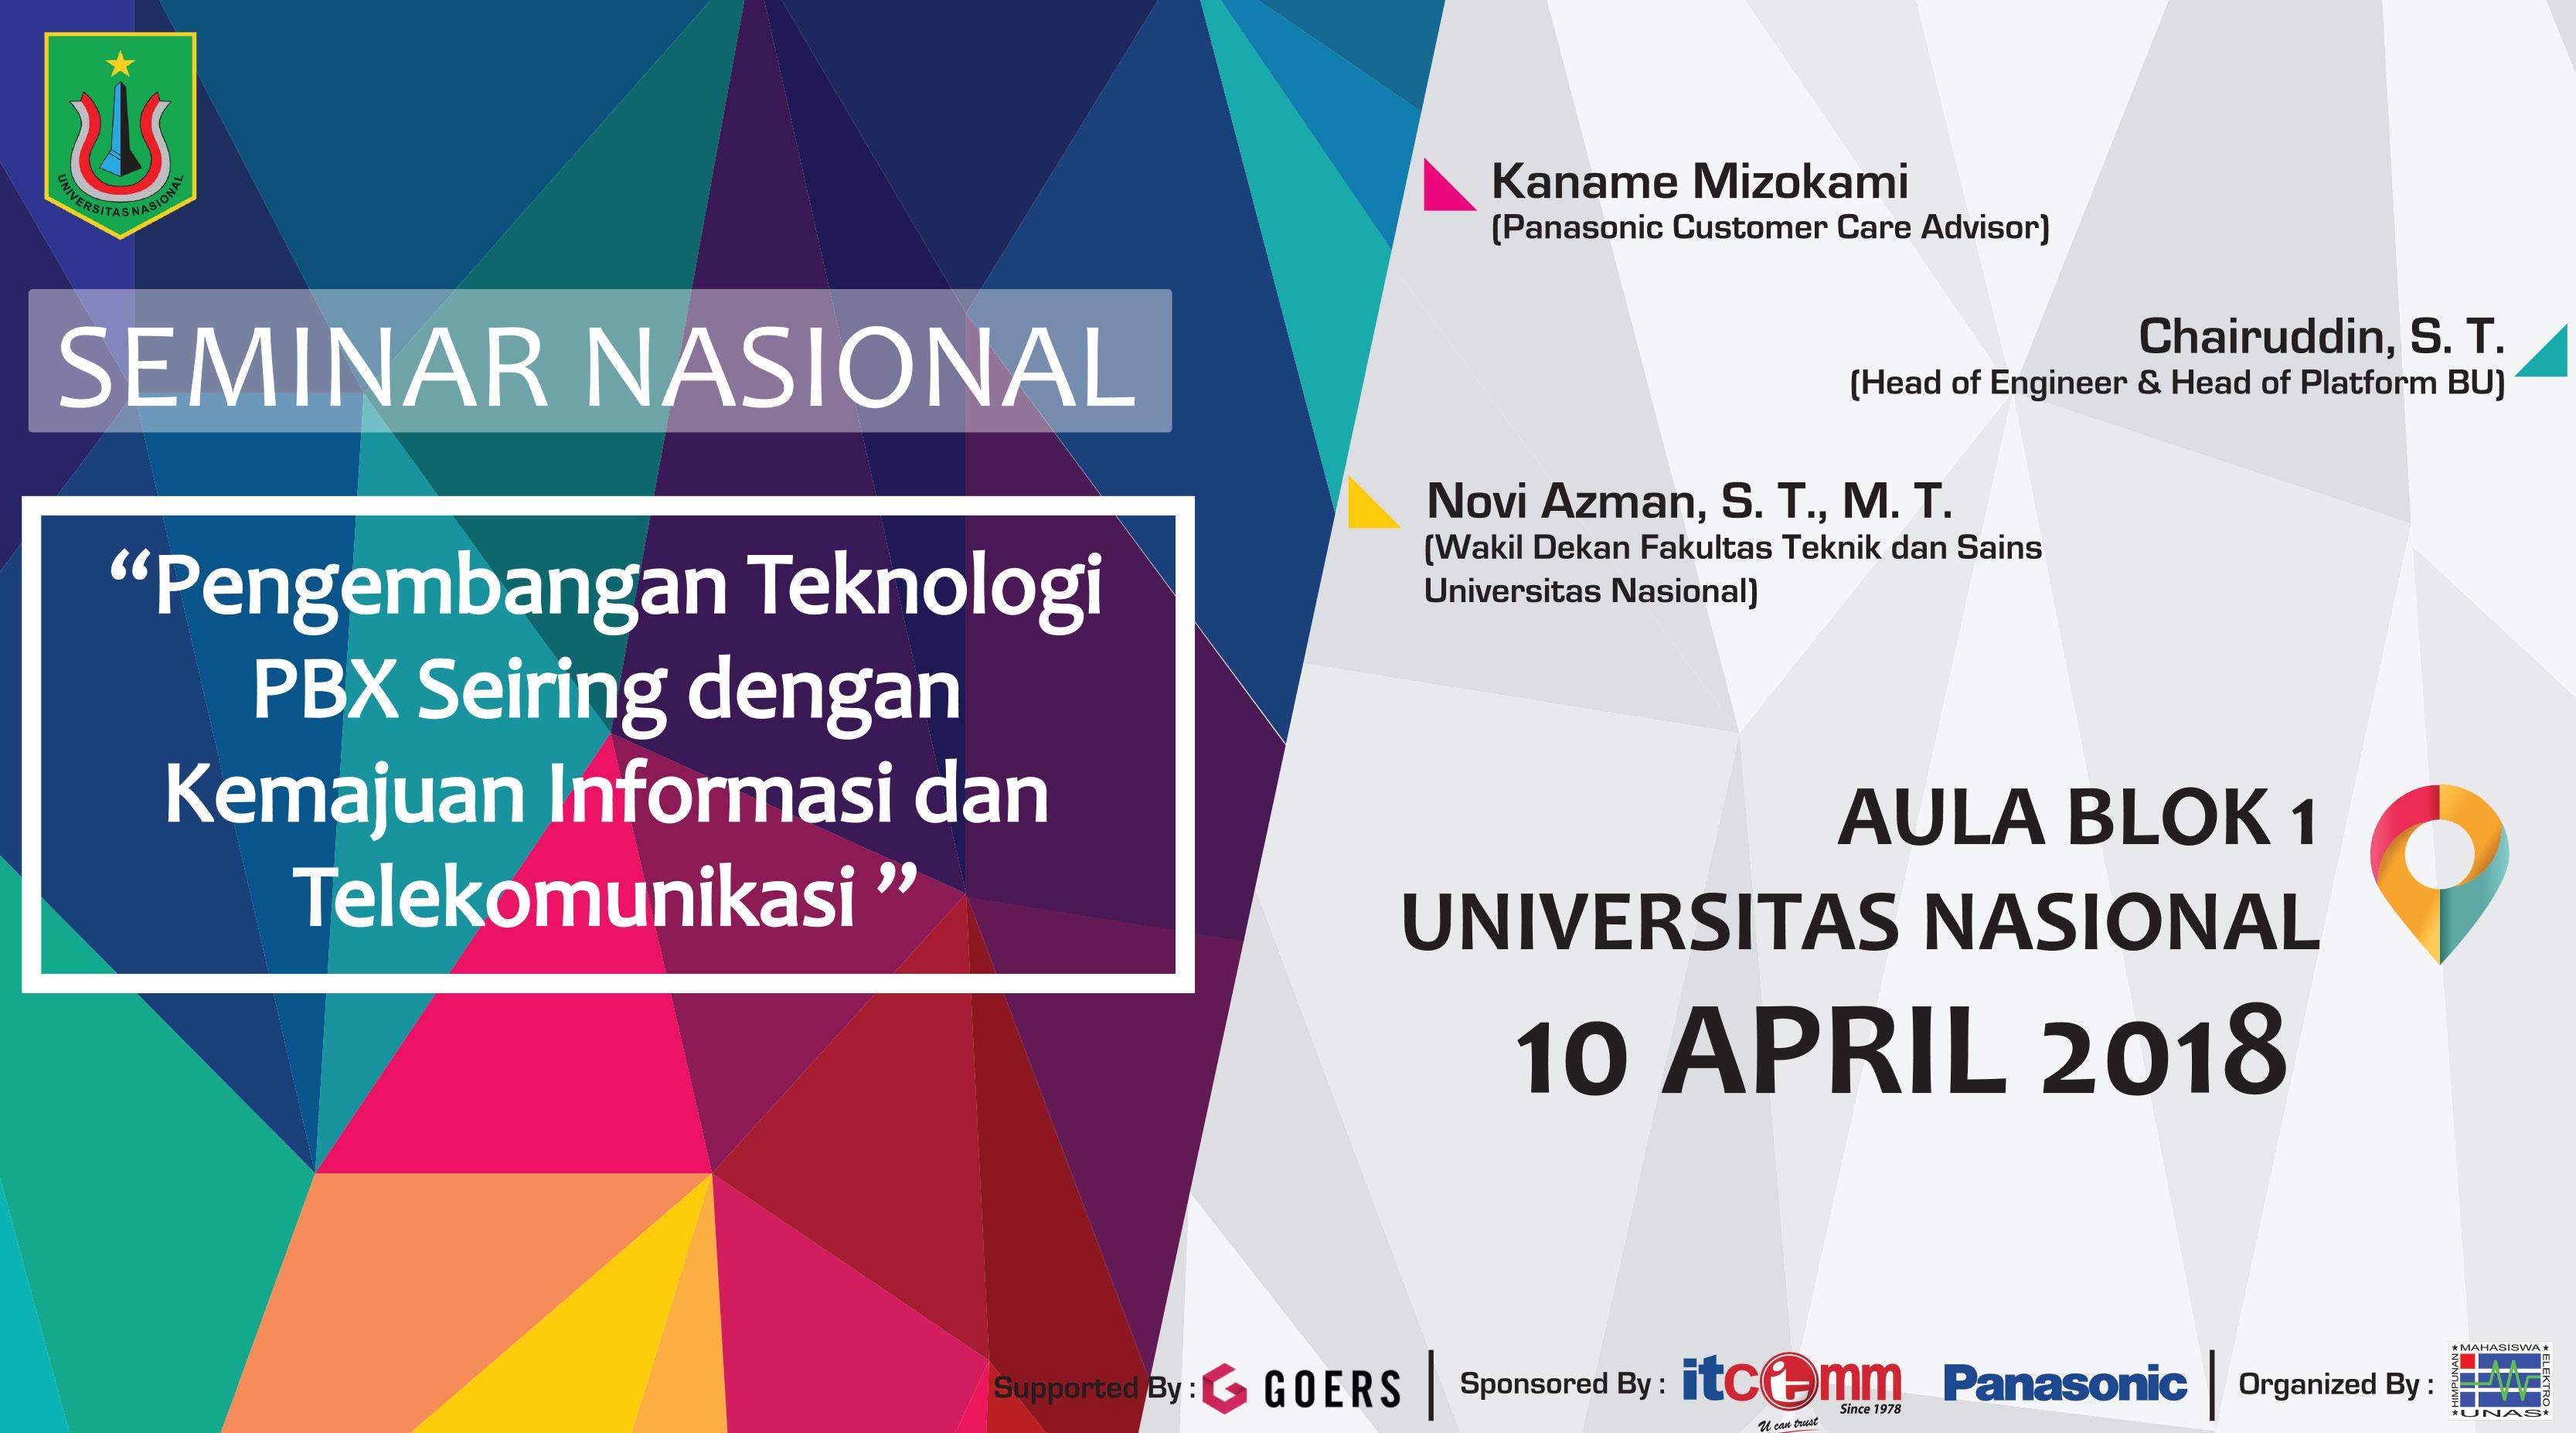 Seminar nasional pengembangan teknologi pbx seiring dengan kemajuan seminar nasional pengembangan teknologi pbx seiring dengan kemajuan informasi dan telekomunikasi ccuart Choice Image